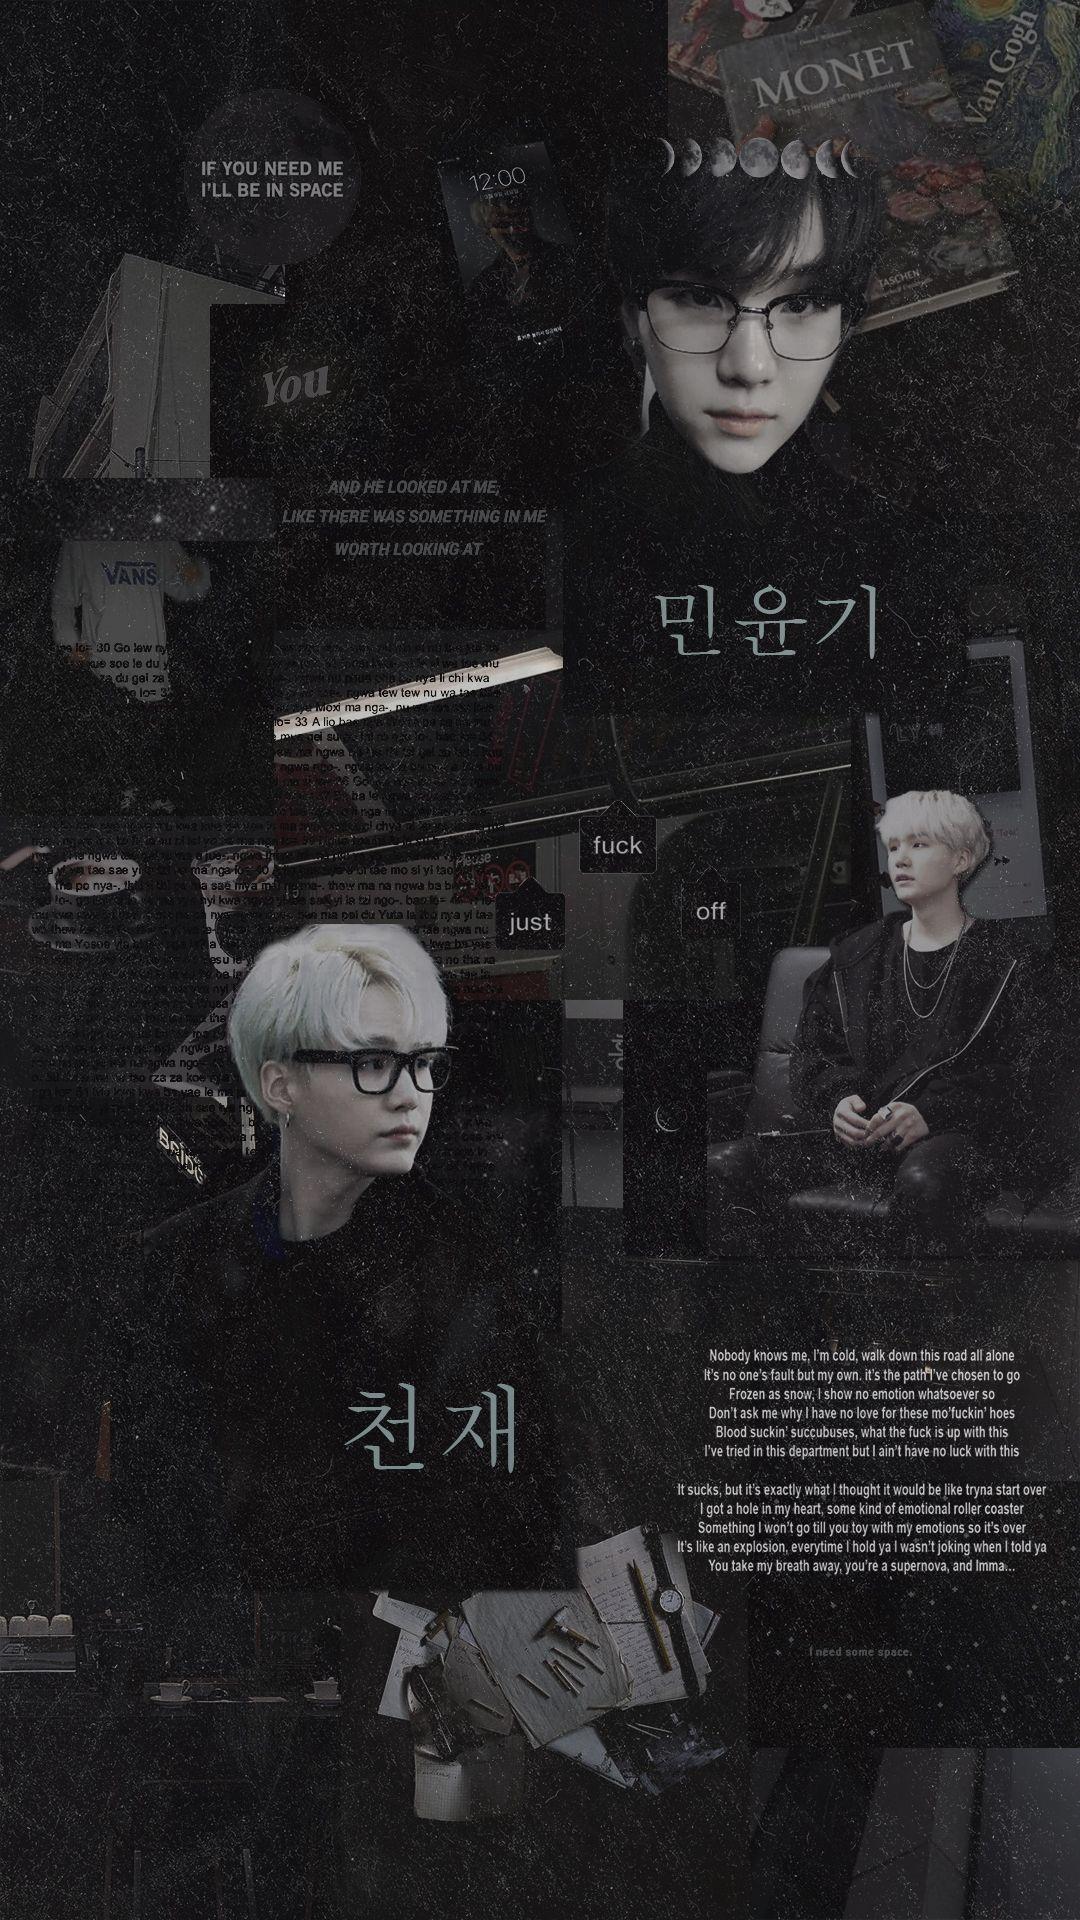 Suga / yoongi wallpaper | lock screen [bts] pin: @editthis ig: @elizabeth_onchul tb: @moonsquare  #bts #dark #yoongi #minyoongi #aesthetic #aesthetics #suga #wallpaper #kpop #방탄소년단 #민윤기 #윤기 #슈가 #btswallpaper